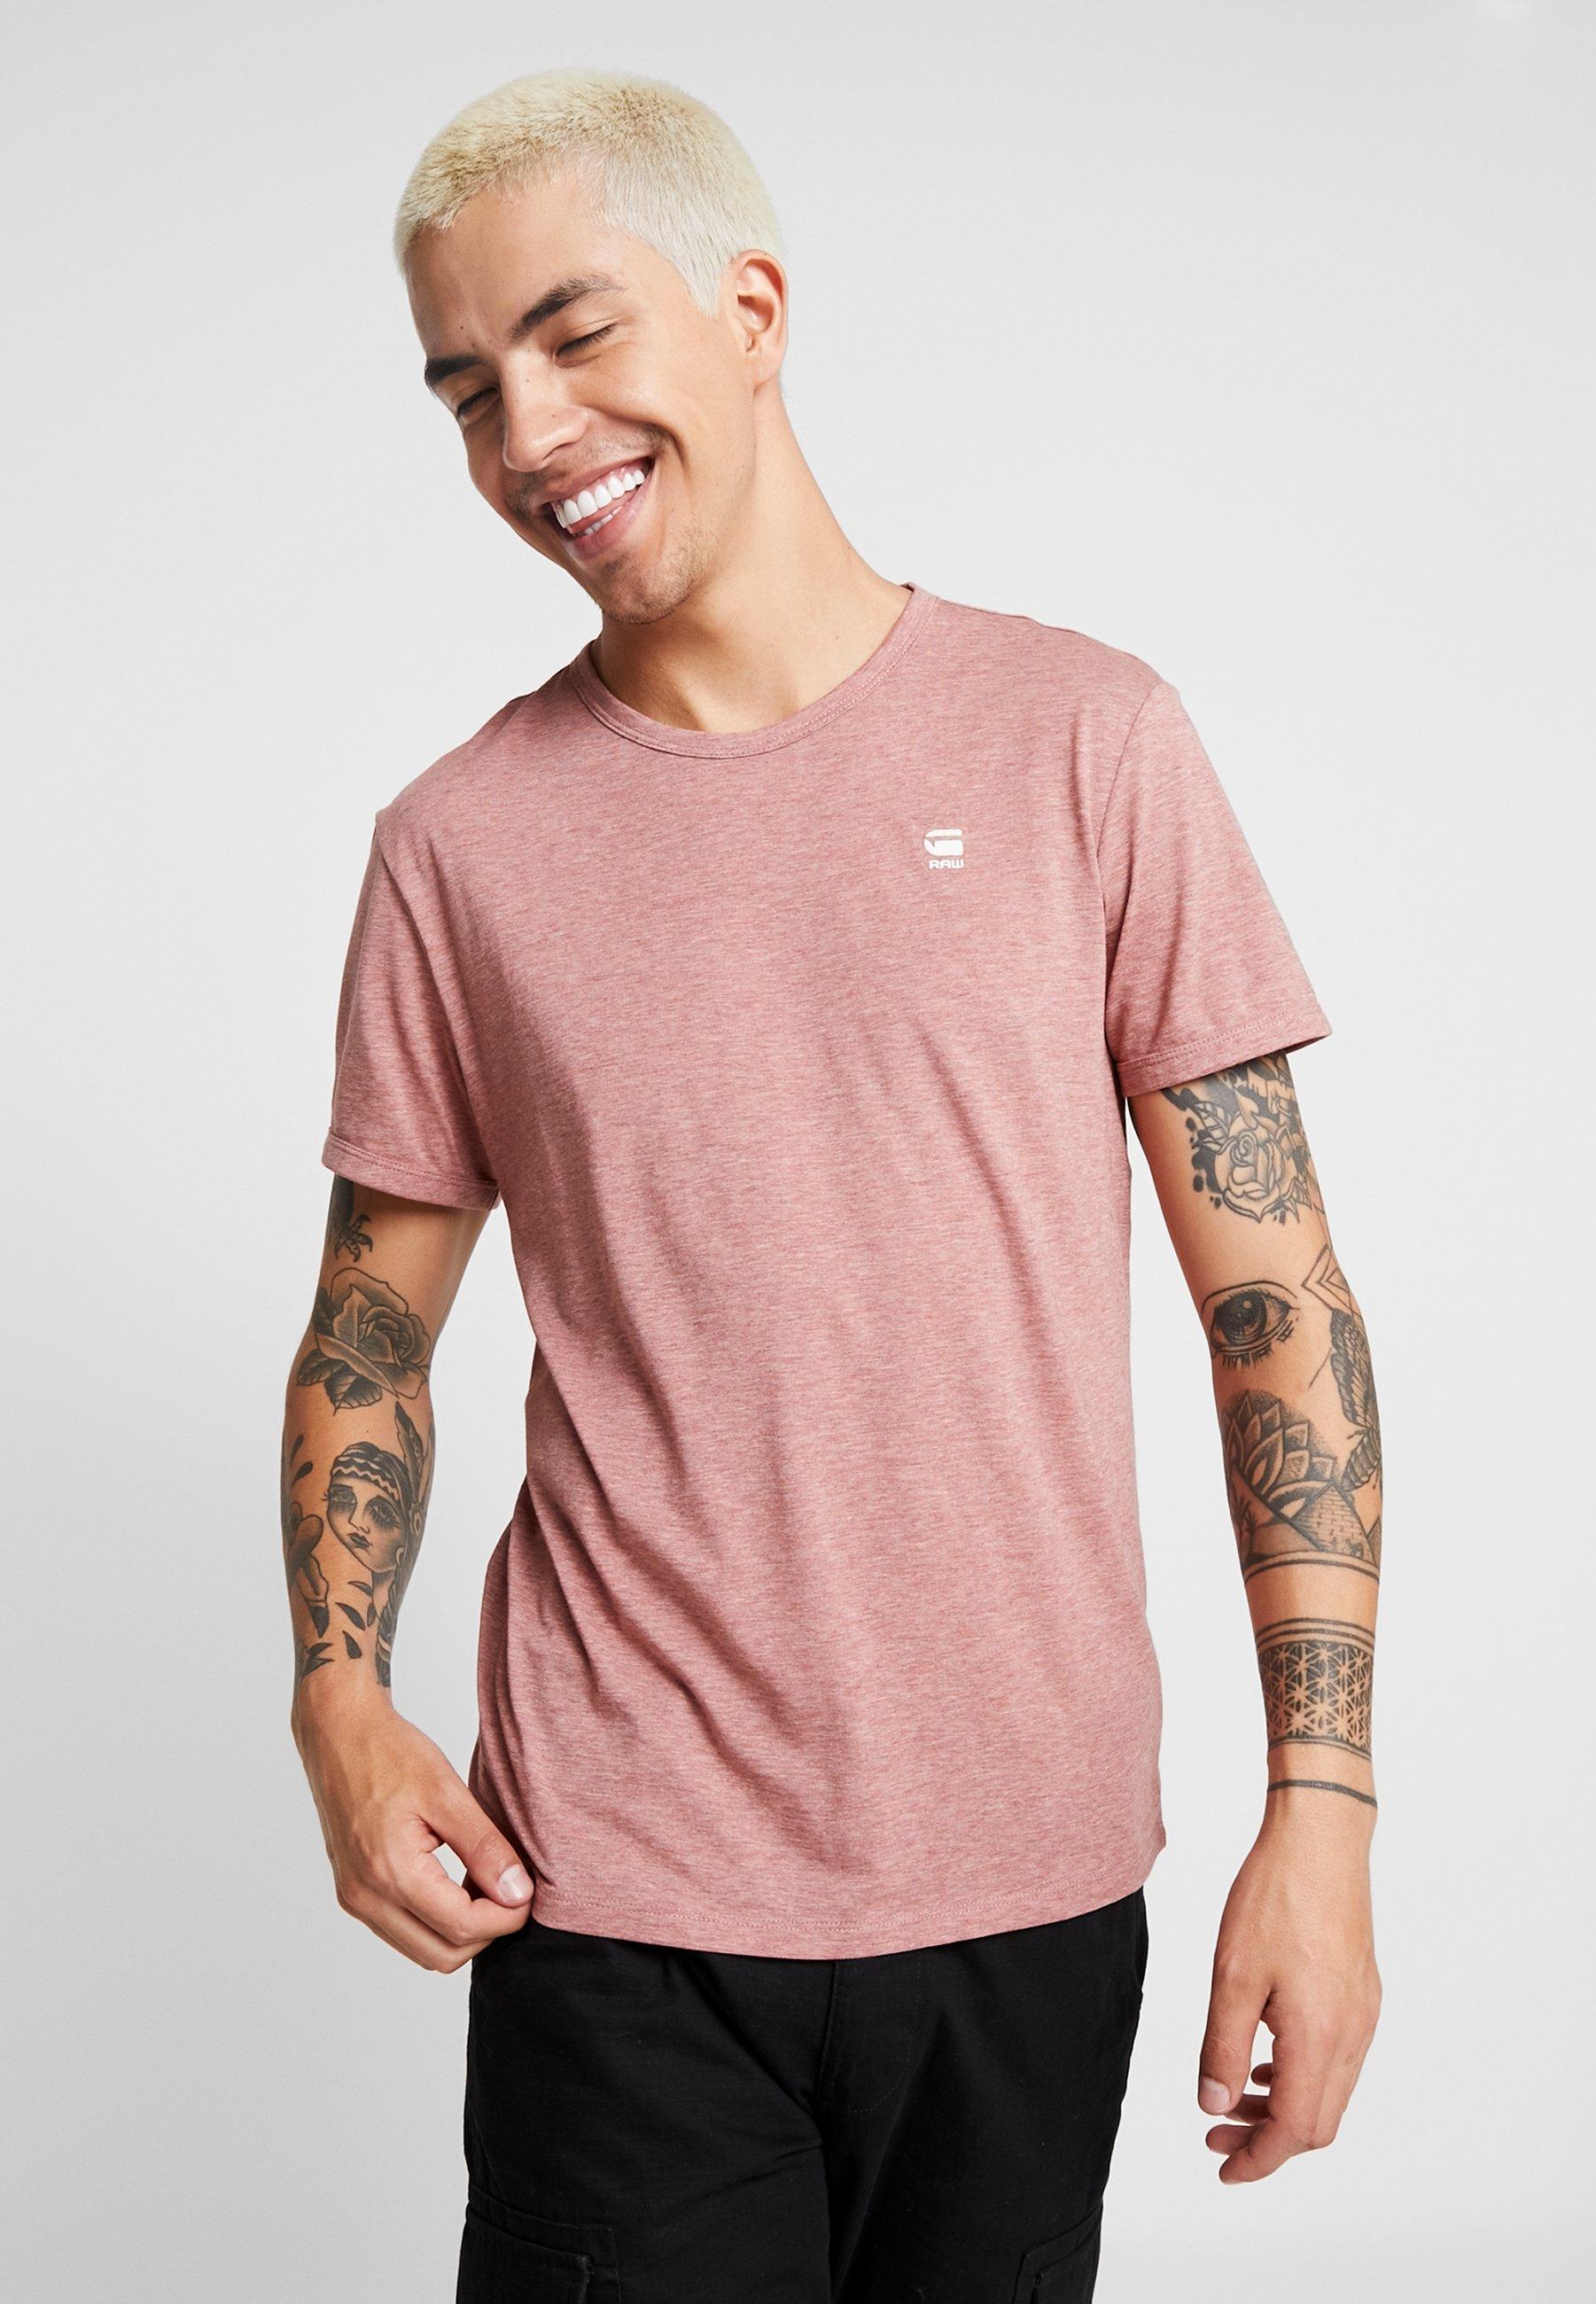 Tea Basique G shirt Rose BaseT star gI6yf7Ybv